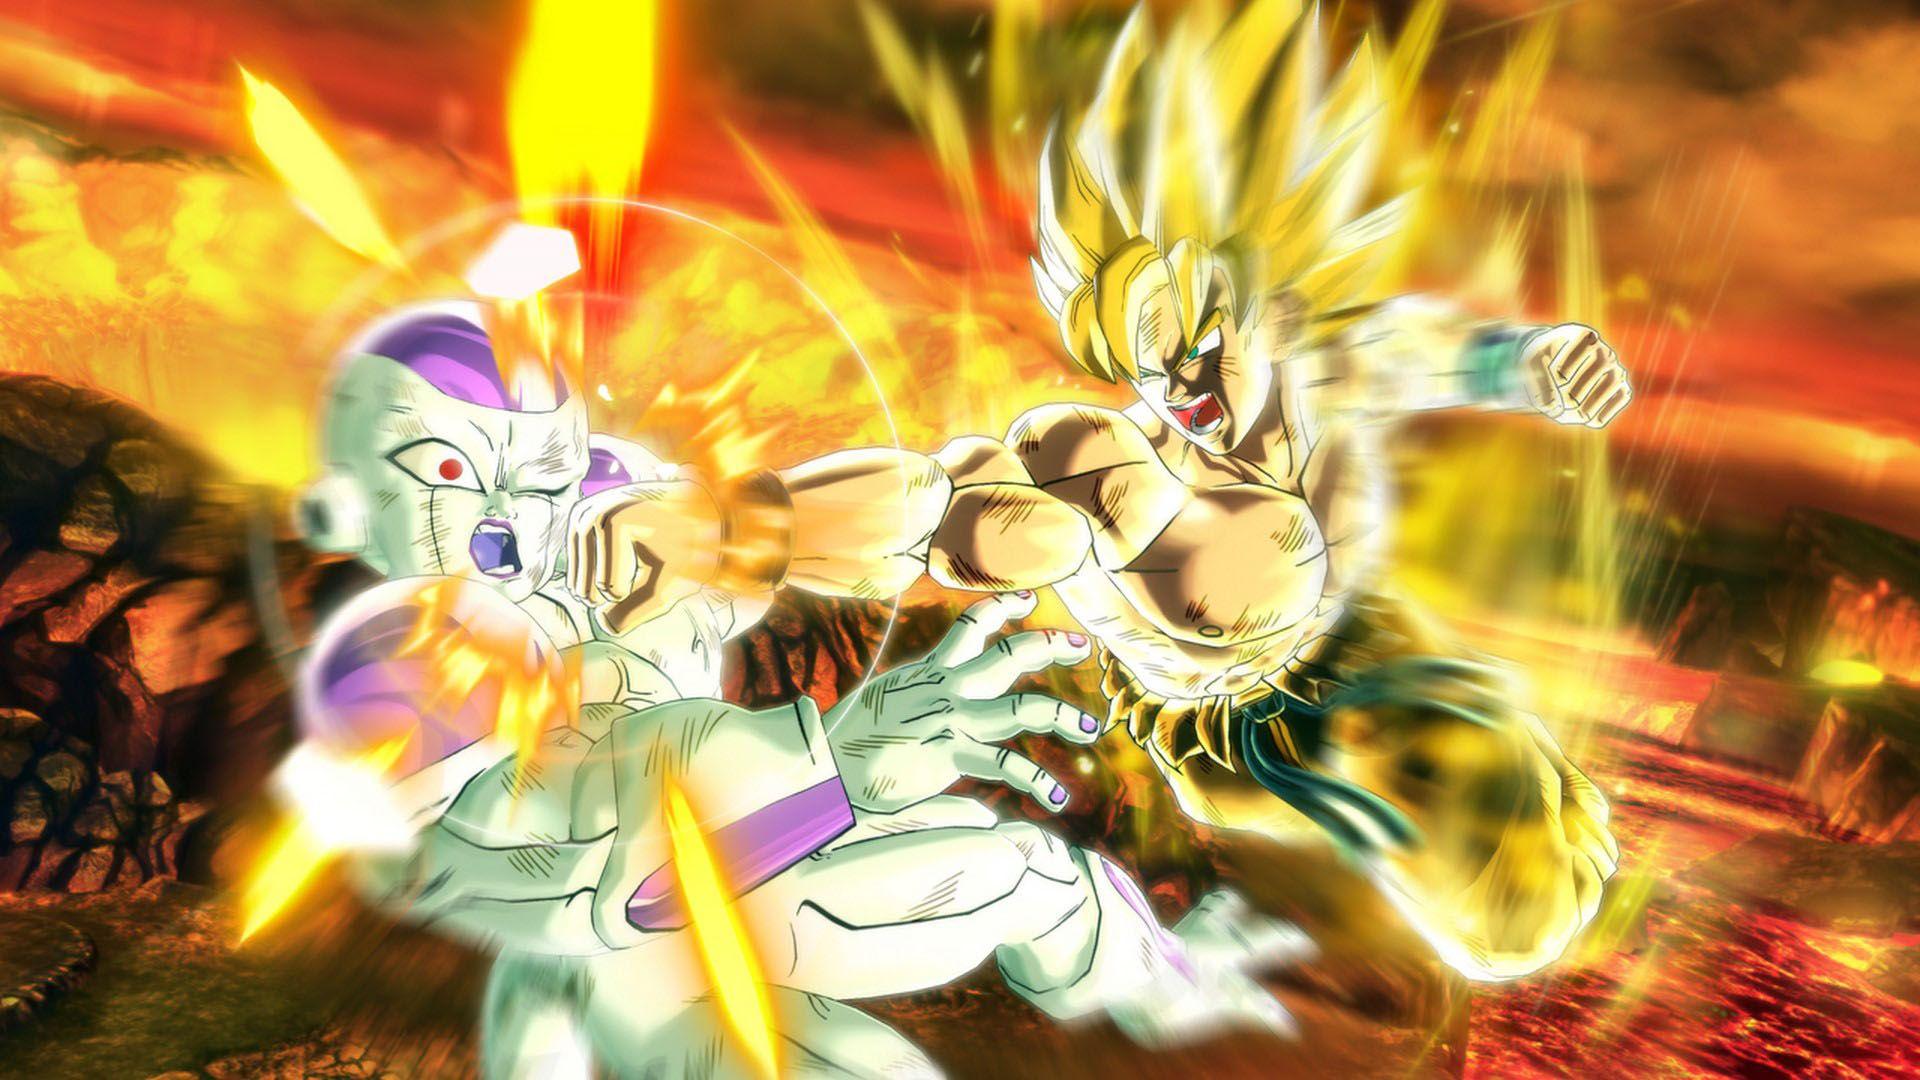 10df4670 Goku Super Saiyan 2 Dragon Ball Xenoverse | Wallpaper HD 1080p ...